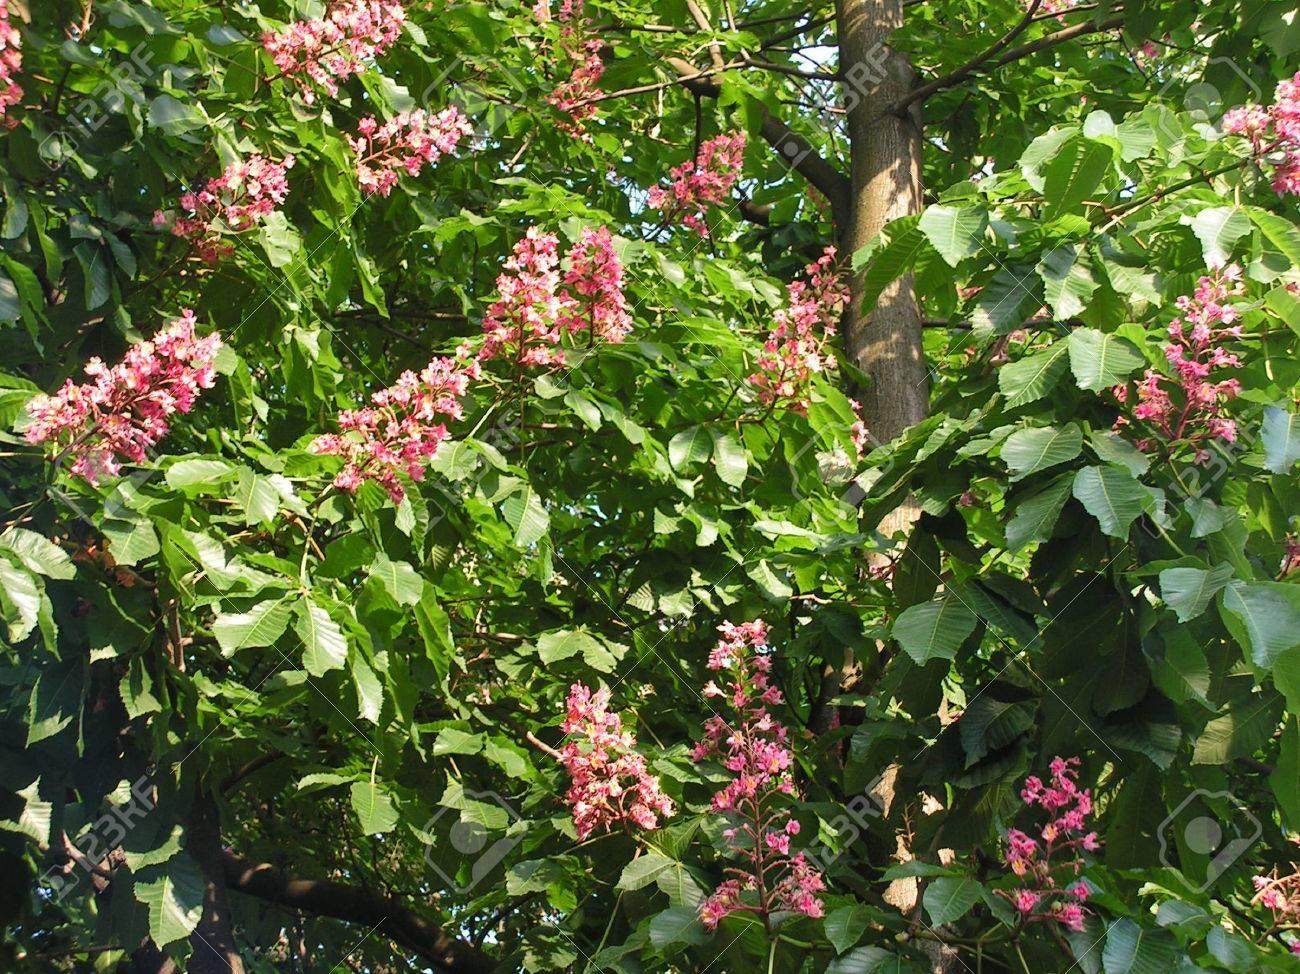 Chestnut tree with pink flowers stock photo picture and royalty chestnut tree with pink flowers stock photo 5847352 mightylinksfo